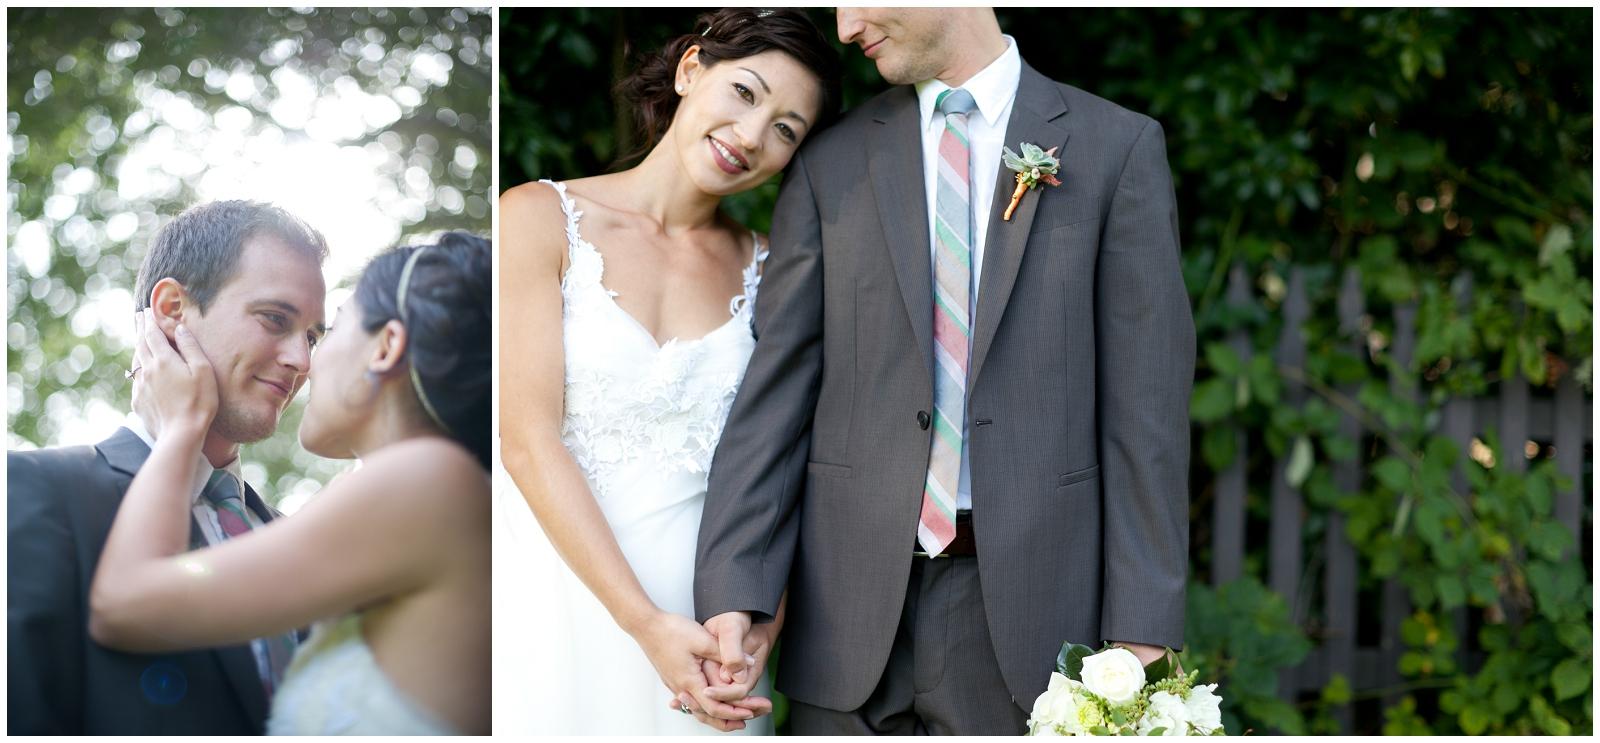 San-Francisco-Bay-Area-Wedding-Photography-Brazilian-Room-9.jpg